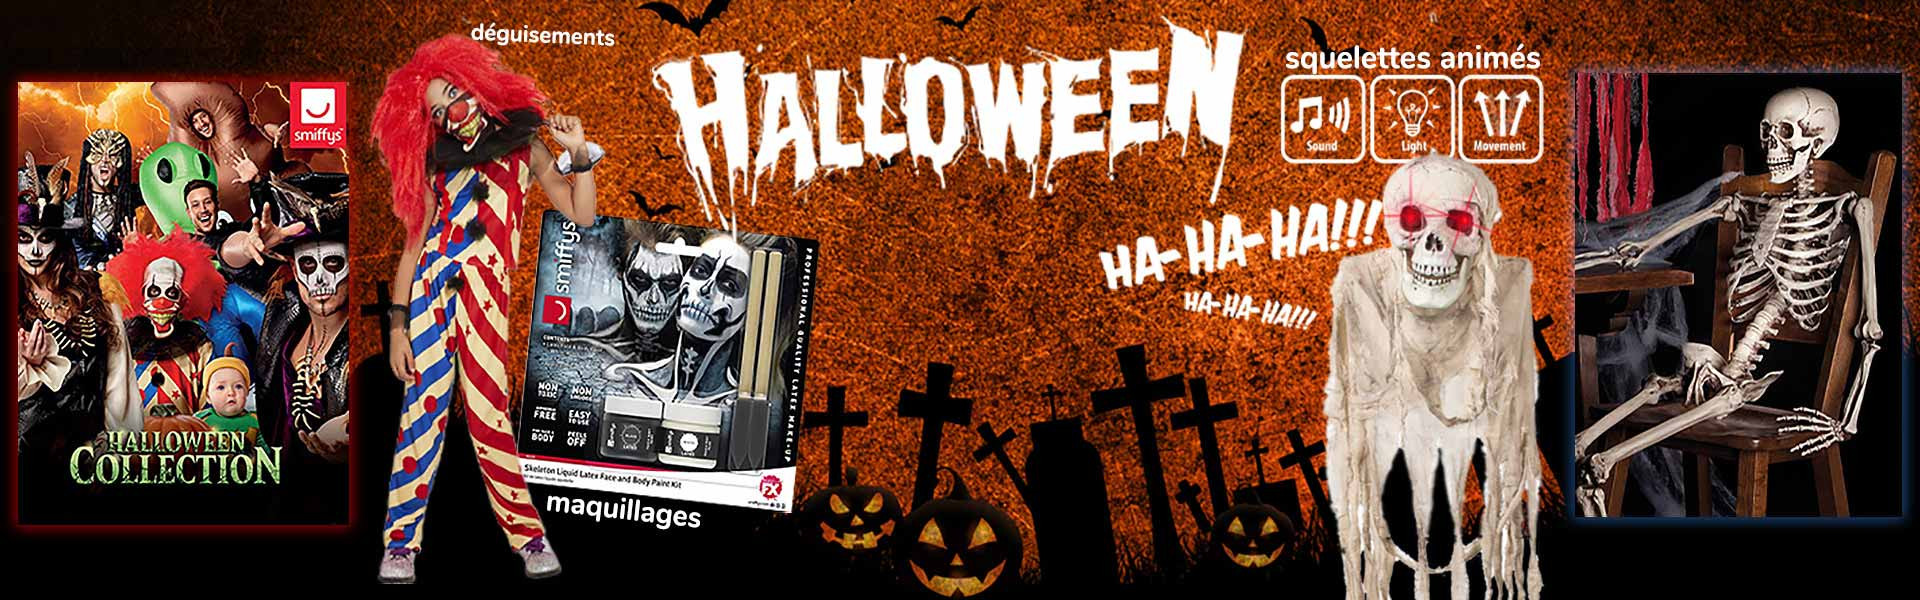 Nos produits Halloween